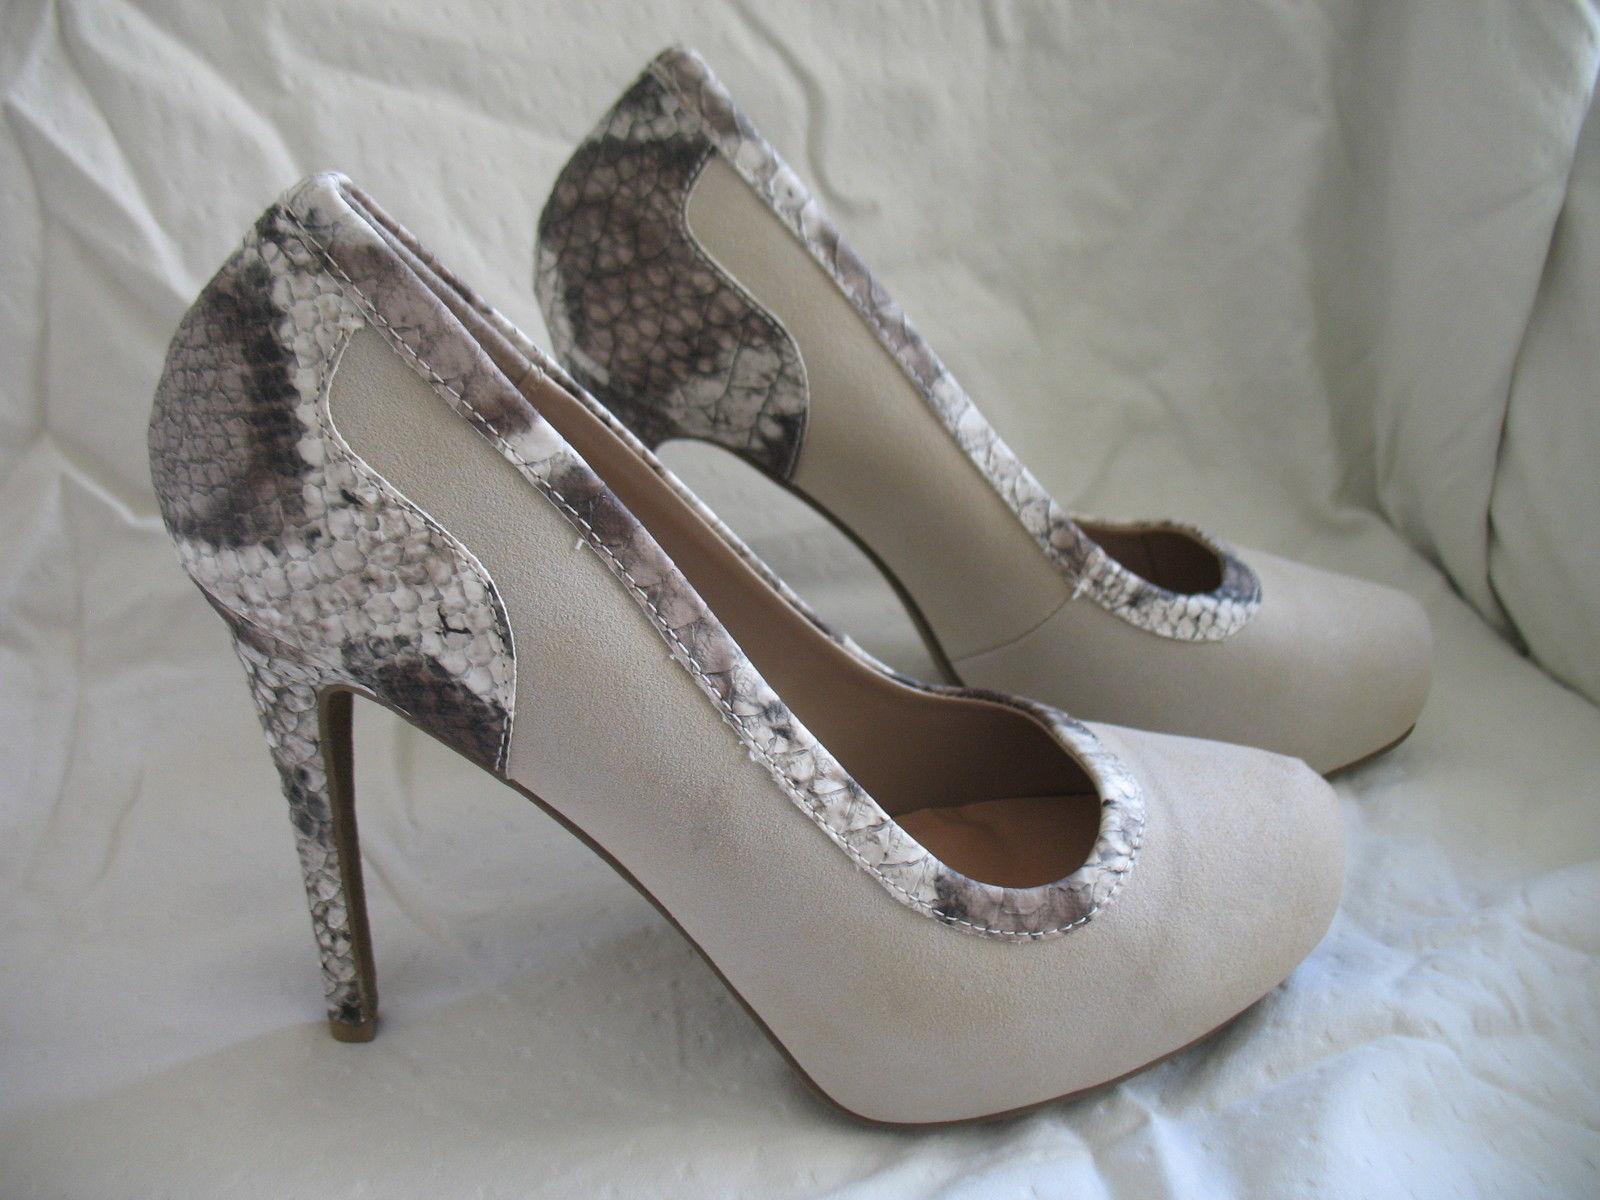 Forever Paula Abdul Size 8 Exotic Print Pump New High Heel Beige Avon Club Style